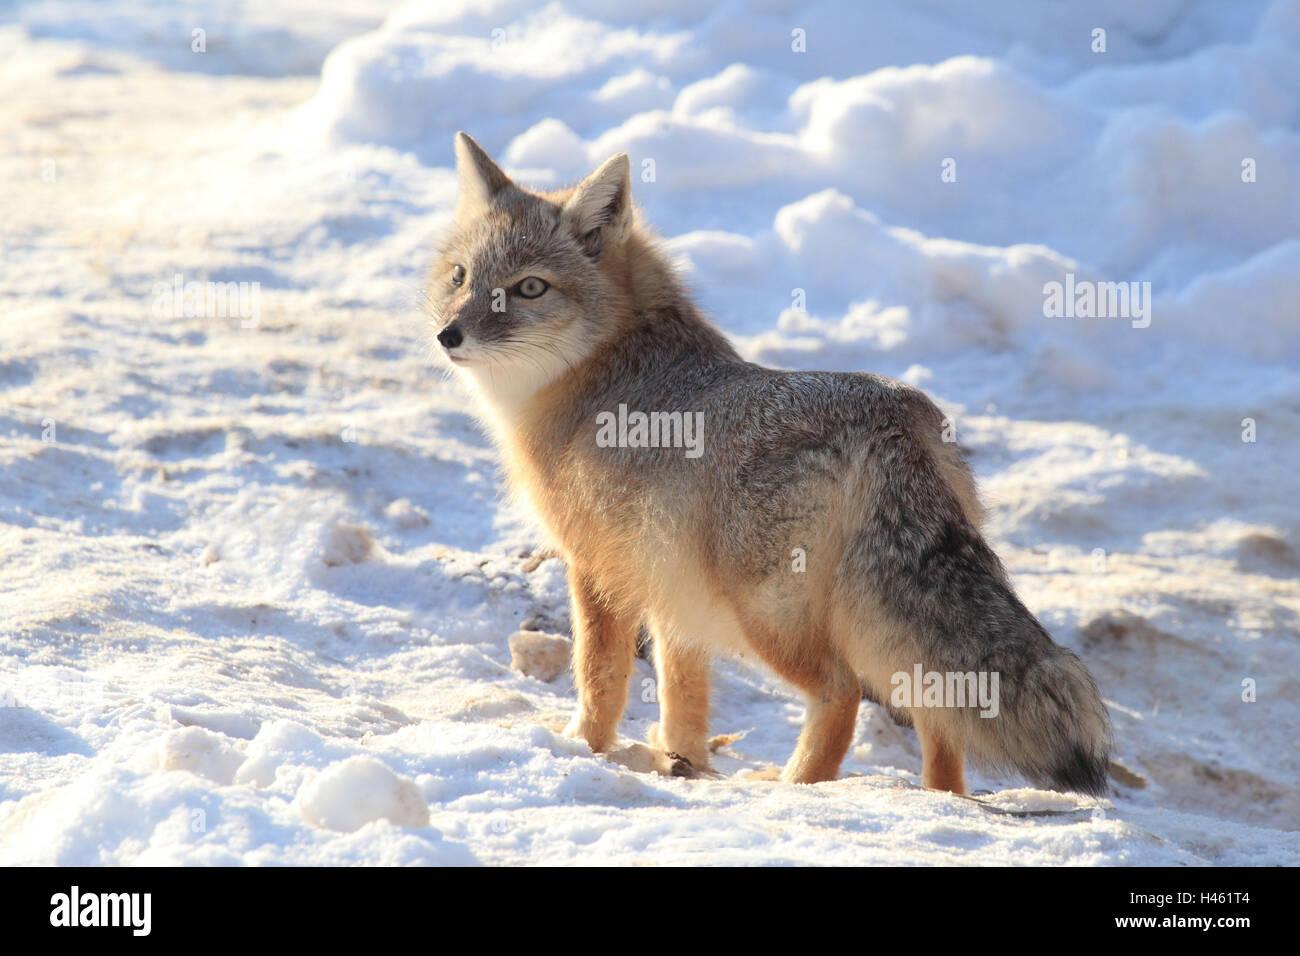 Steppe Fuchs Im Winter Stockfoto Bild 123064372 Alamy